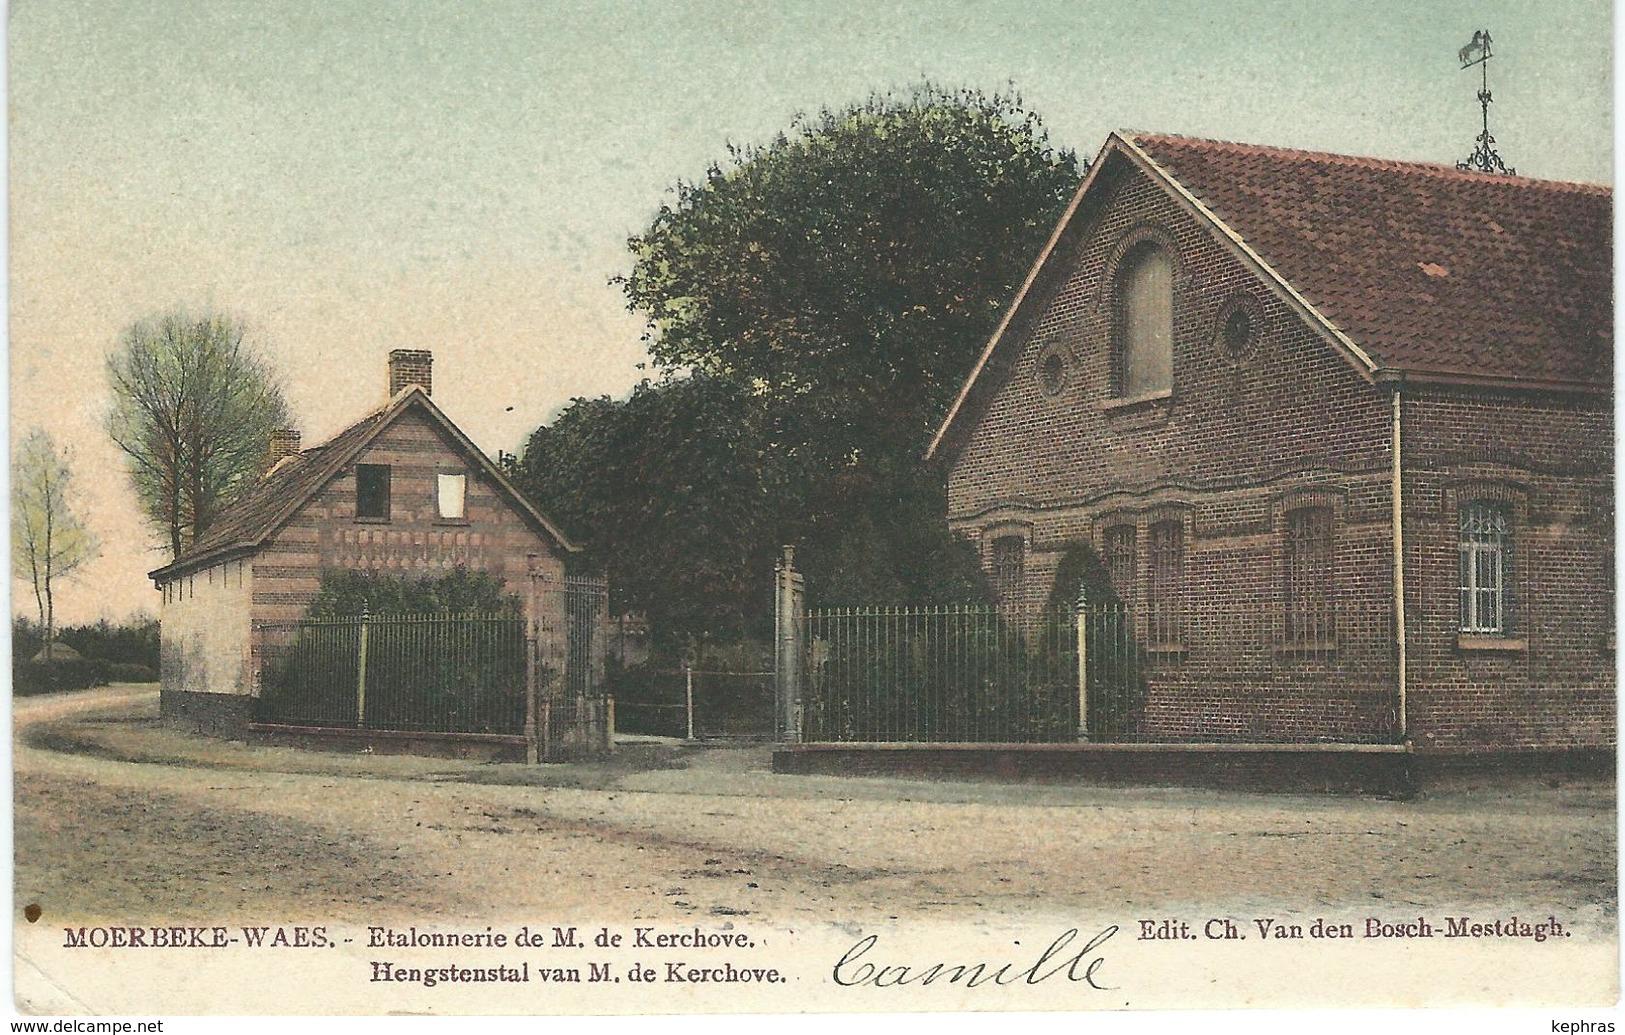 MOERBEKE-WAAS : Etalonnerie De M. De Kerchove - Hengstenstal Van M. De Kerchove - Moerbeke-Waas